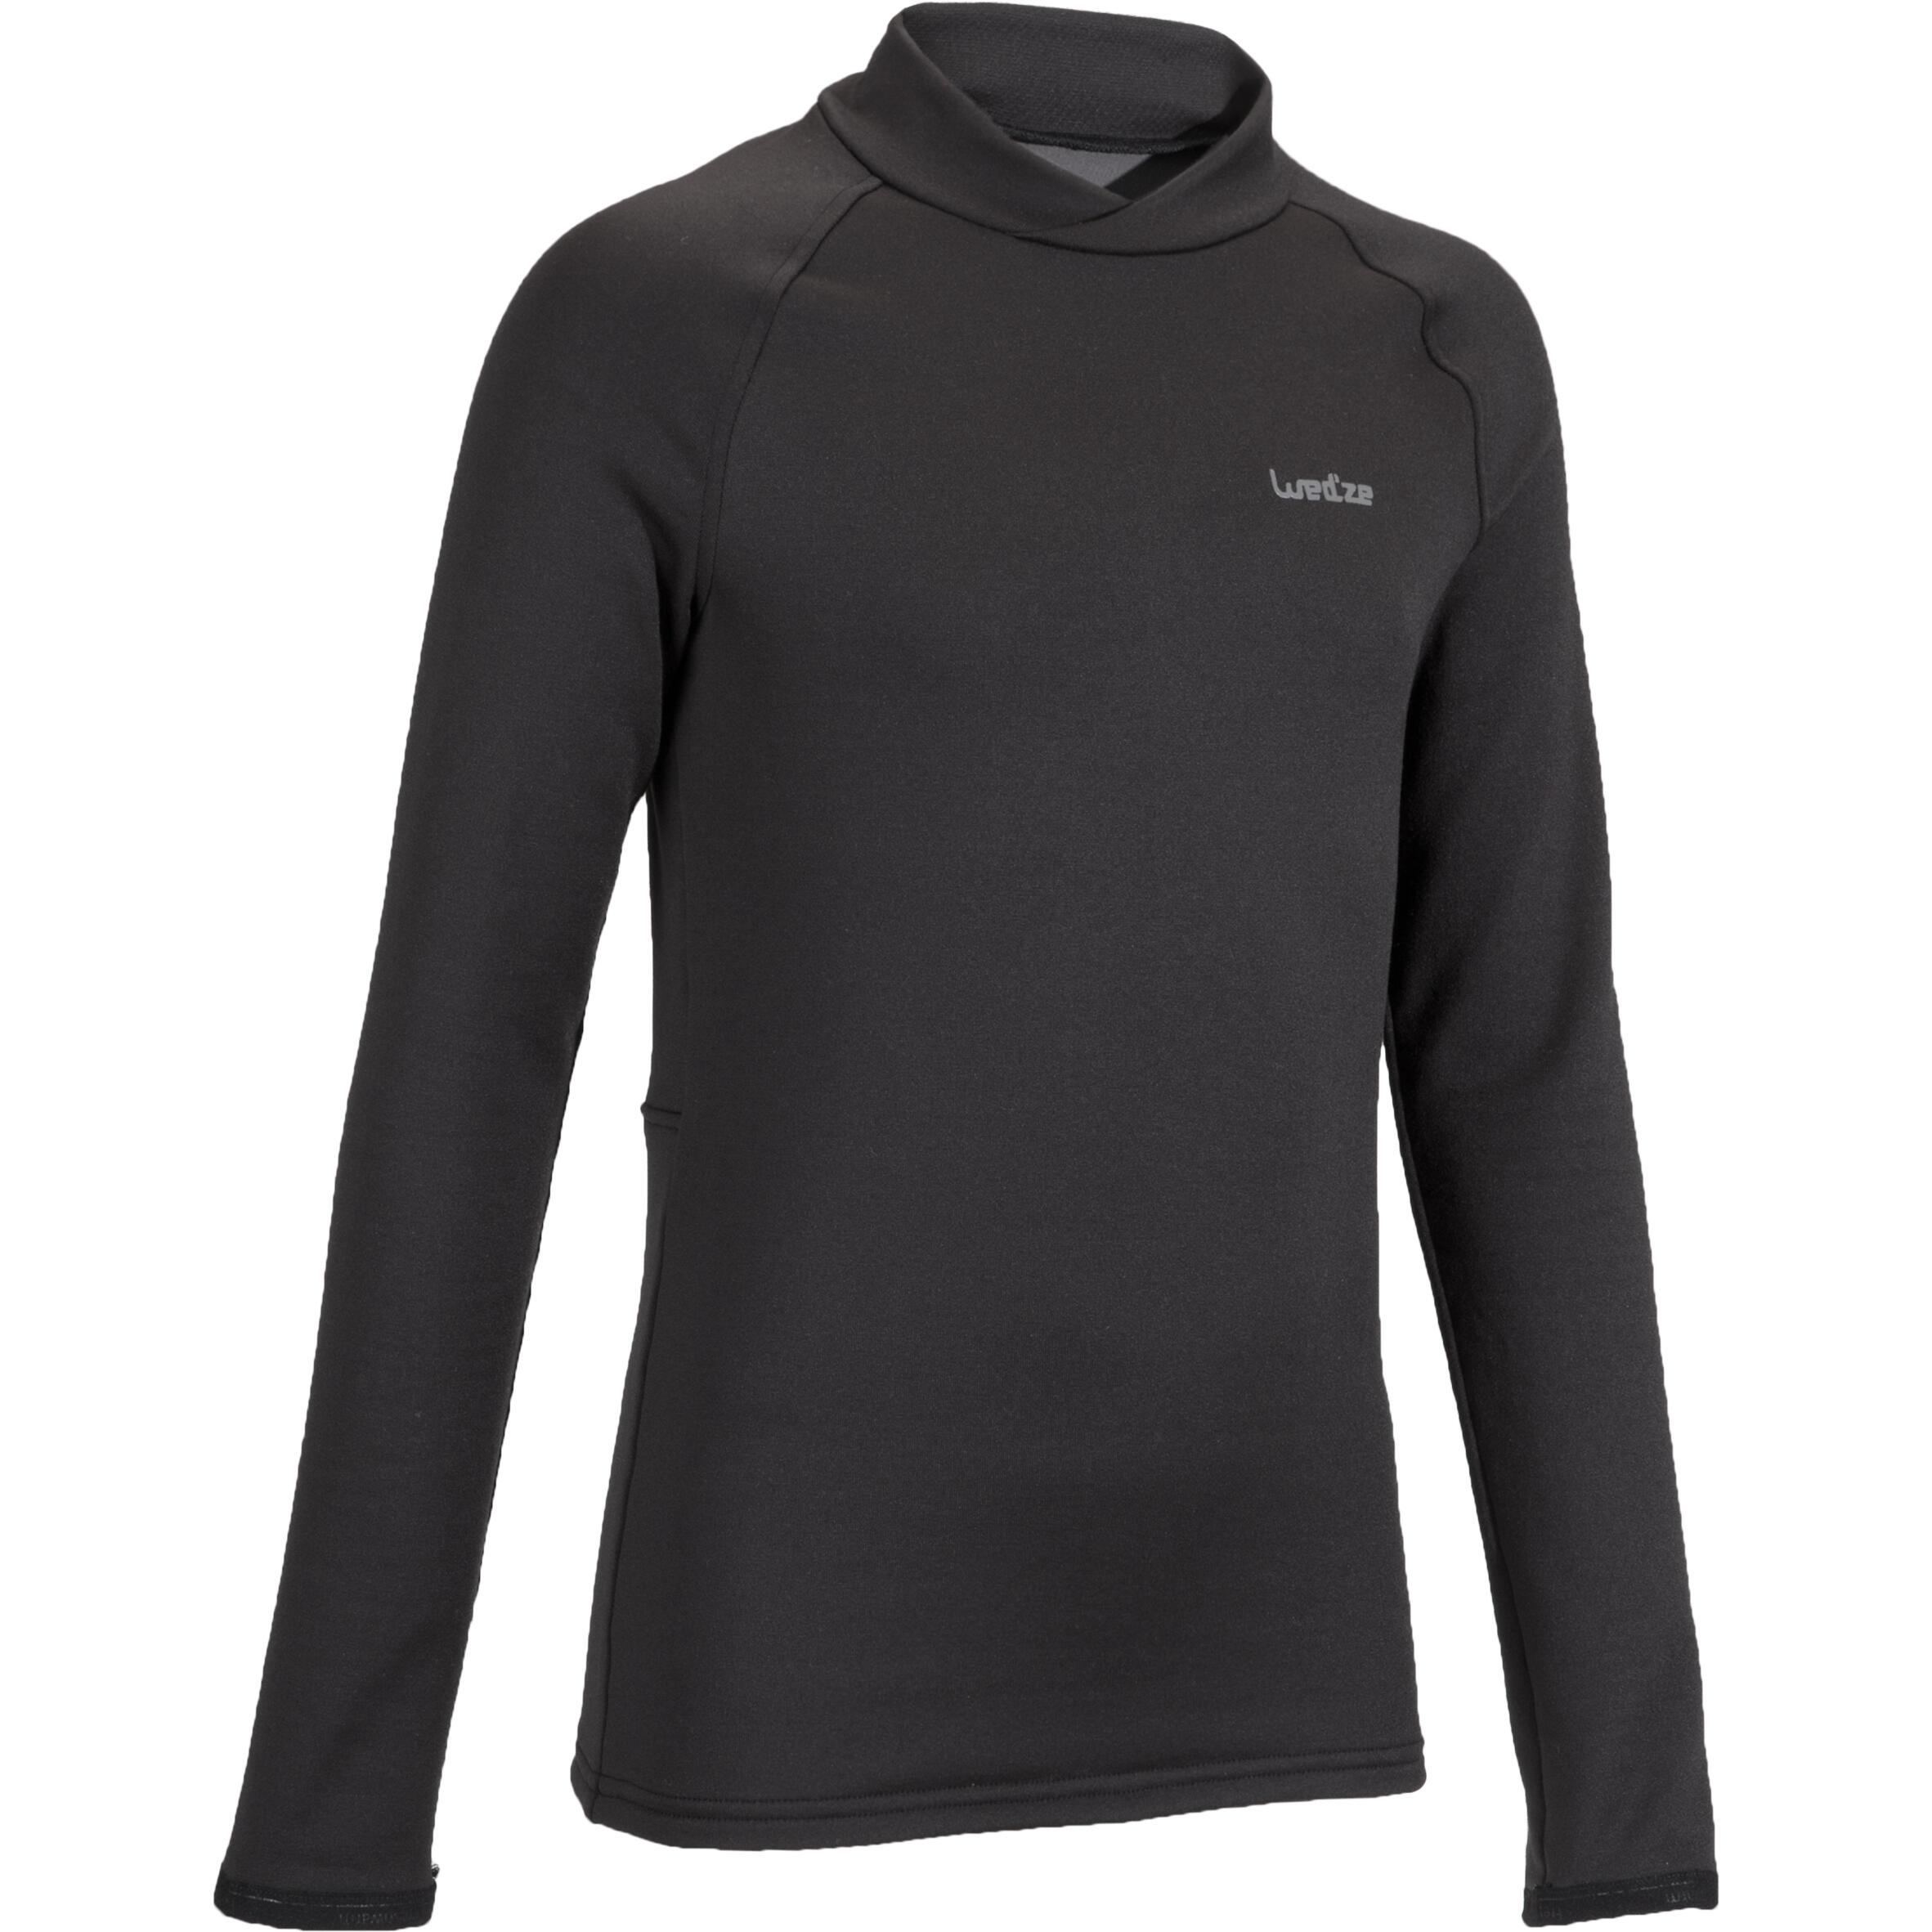 56d65676e Comprar Camiseta Interior Térmica de Esquí Wed ze Freshwarm Niños Negro